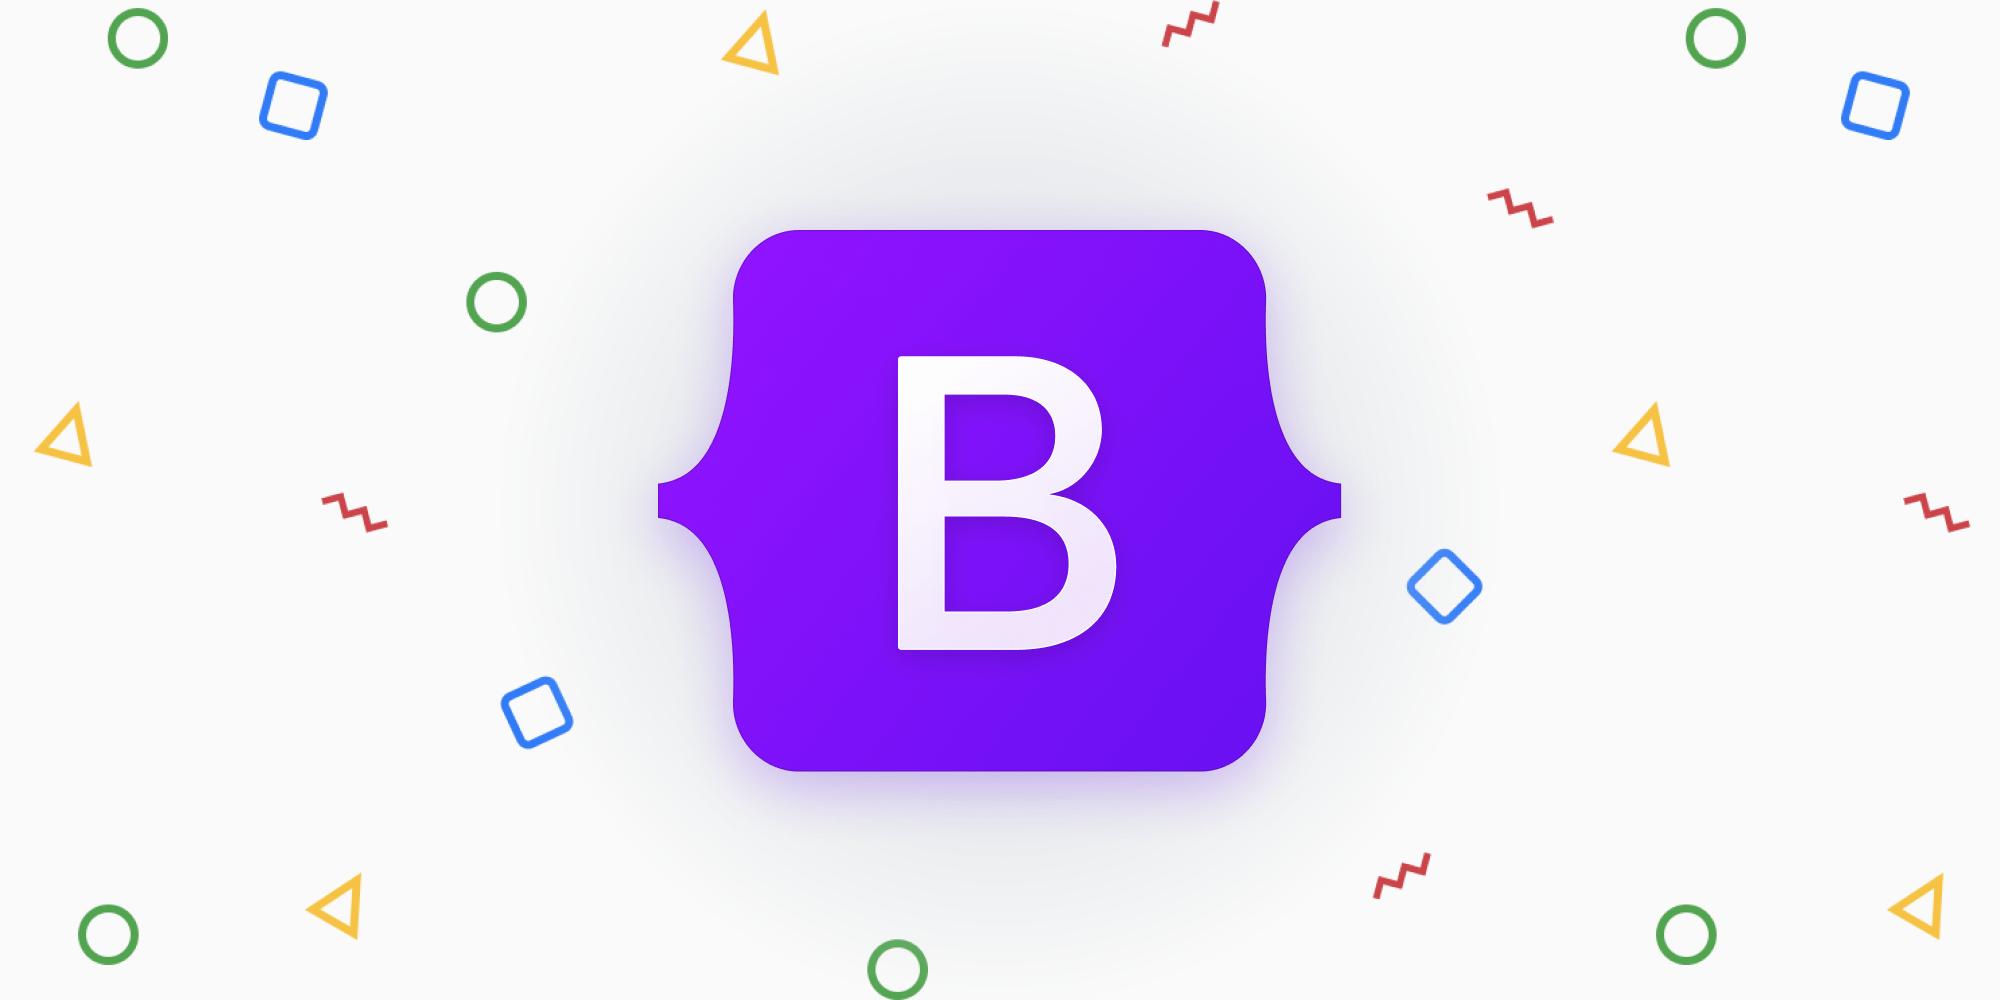 New Bootstrap logo